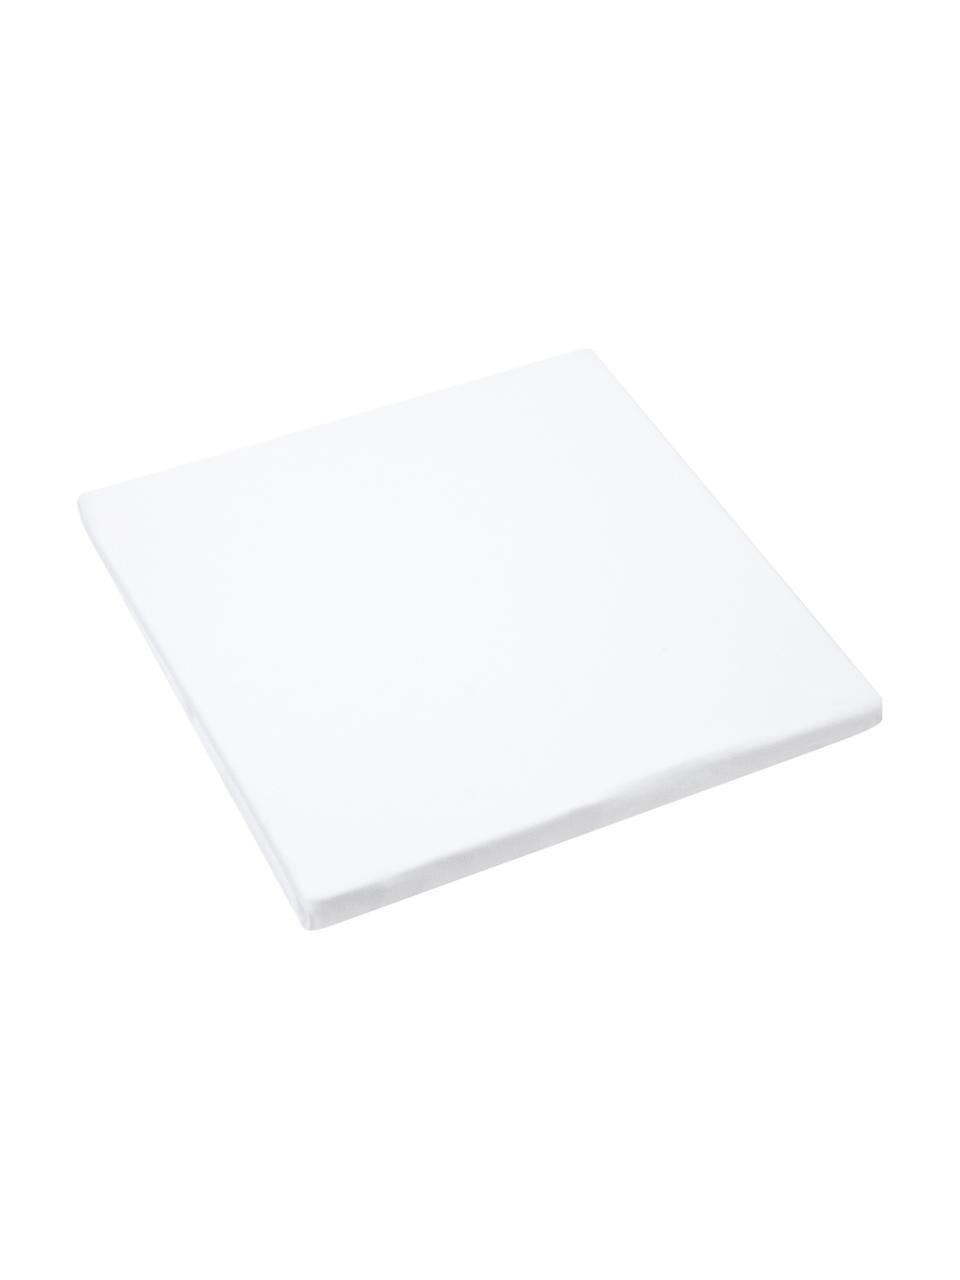 Lenzuolo con angoli  in jersey-elastan bianco Lara, 95% cotone, 5% elastan, Bianco, Larg. 180 x Lung. 200 cm